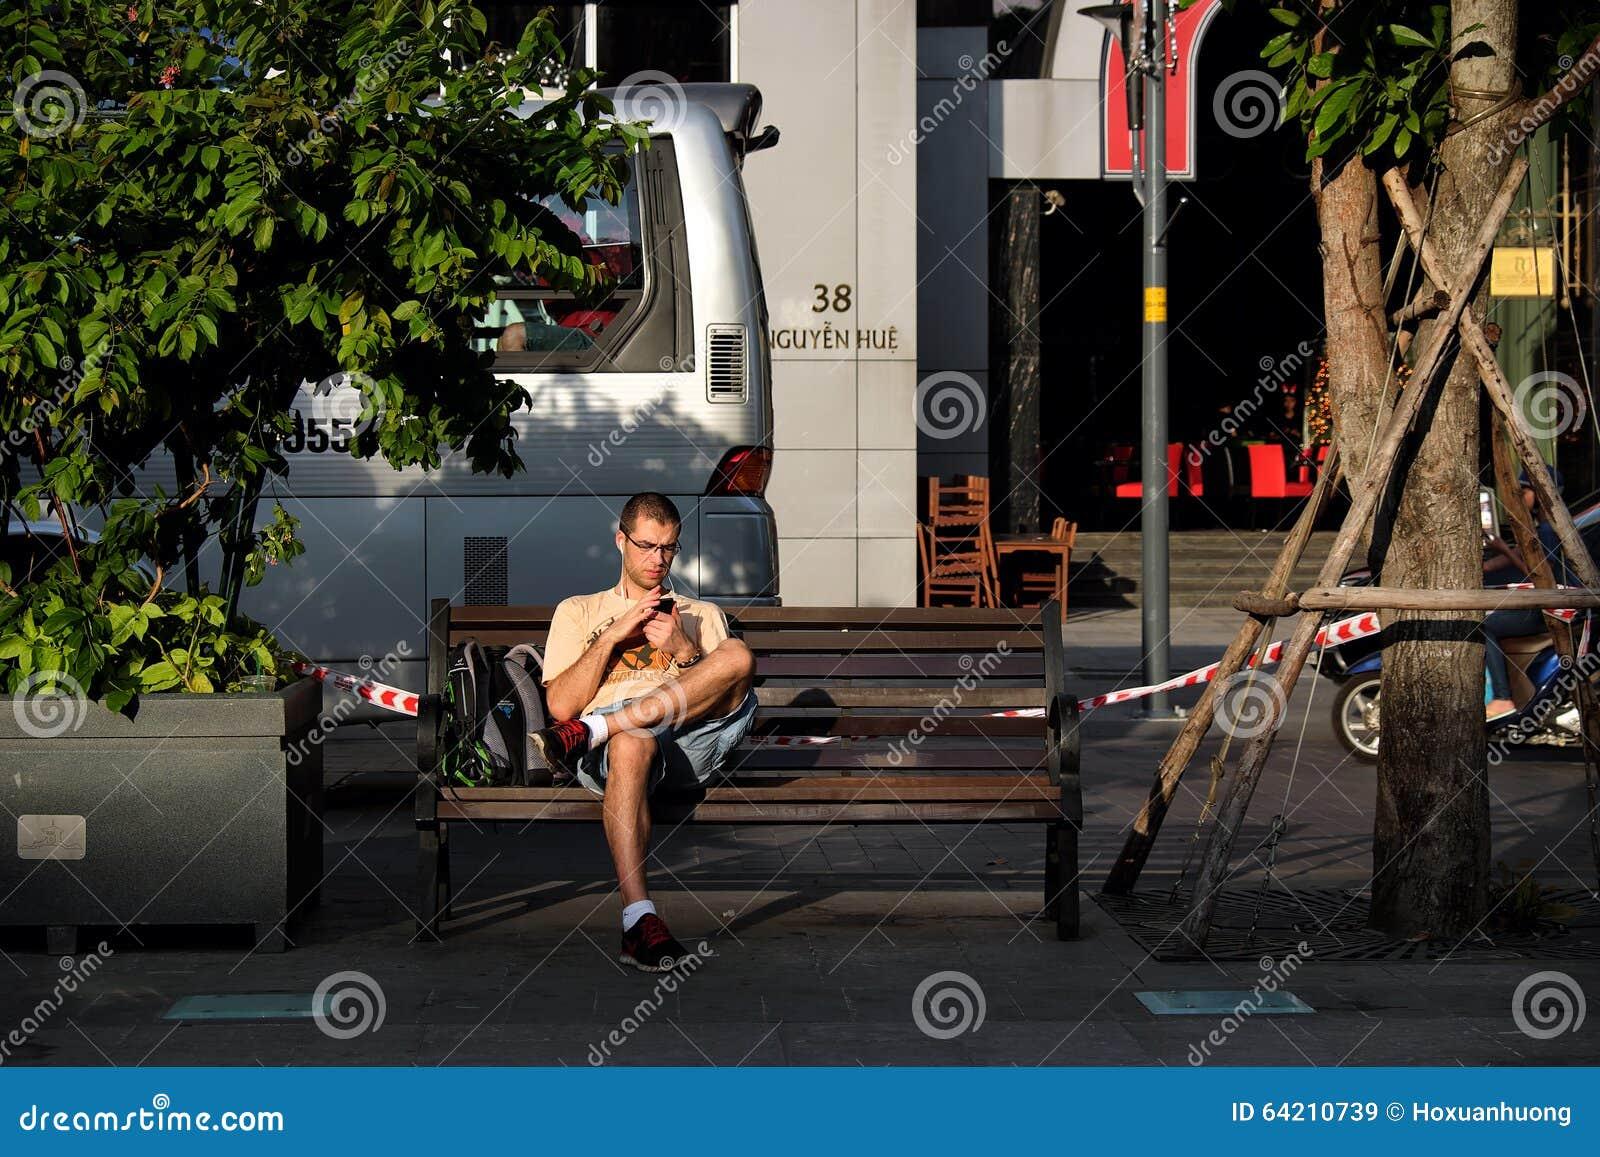 Ciudad de Ho Chi Minh, Vietnam, viajero, turista